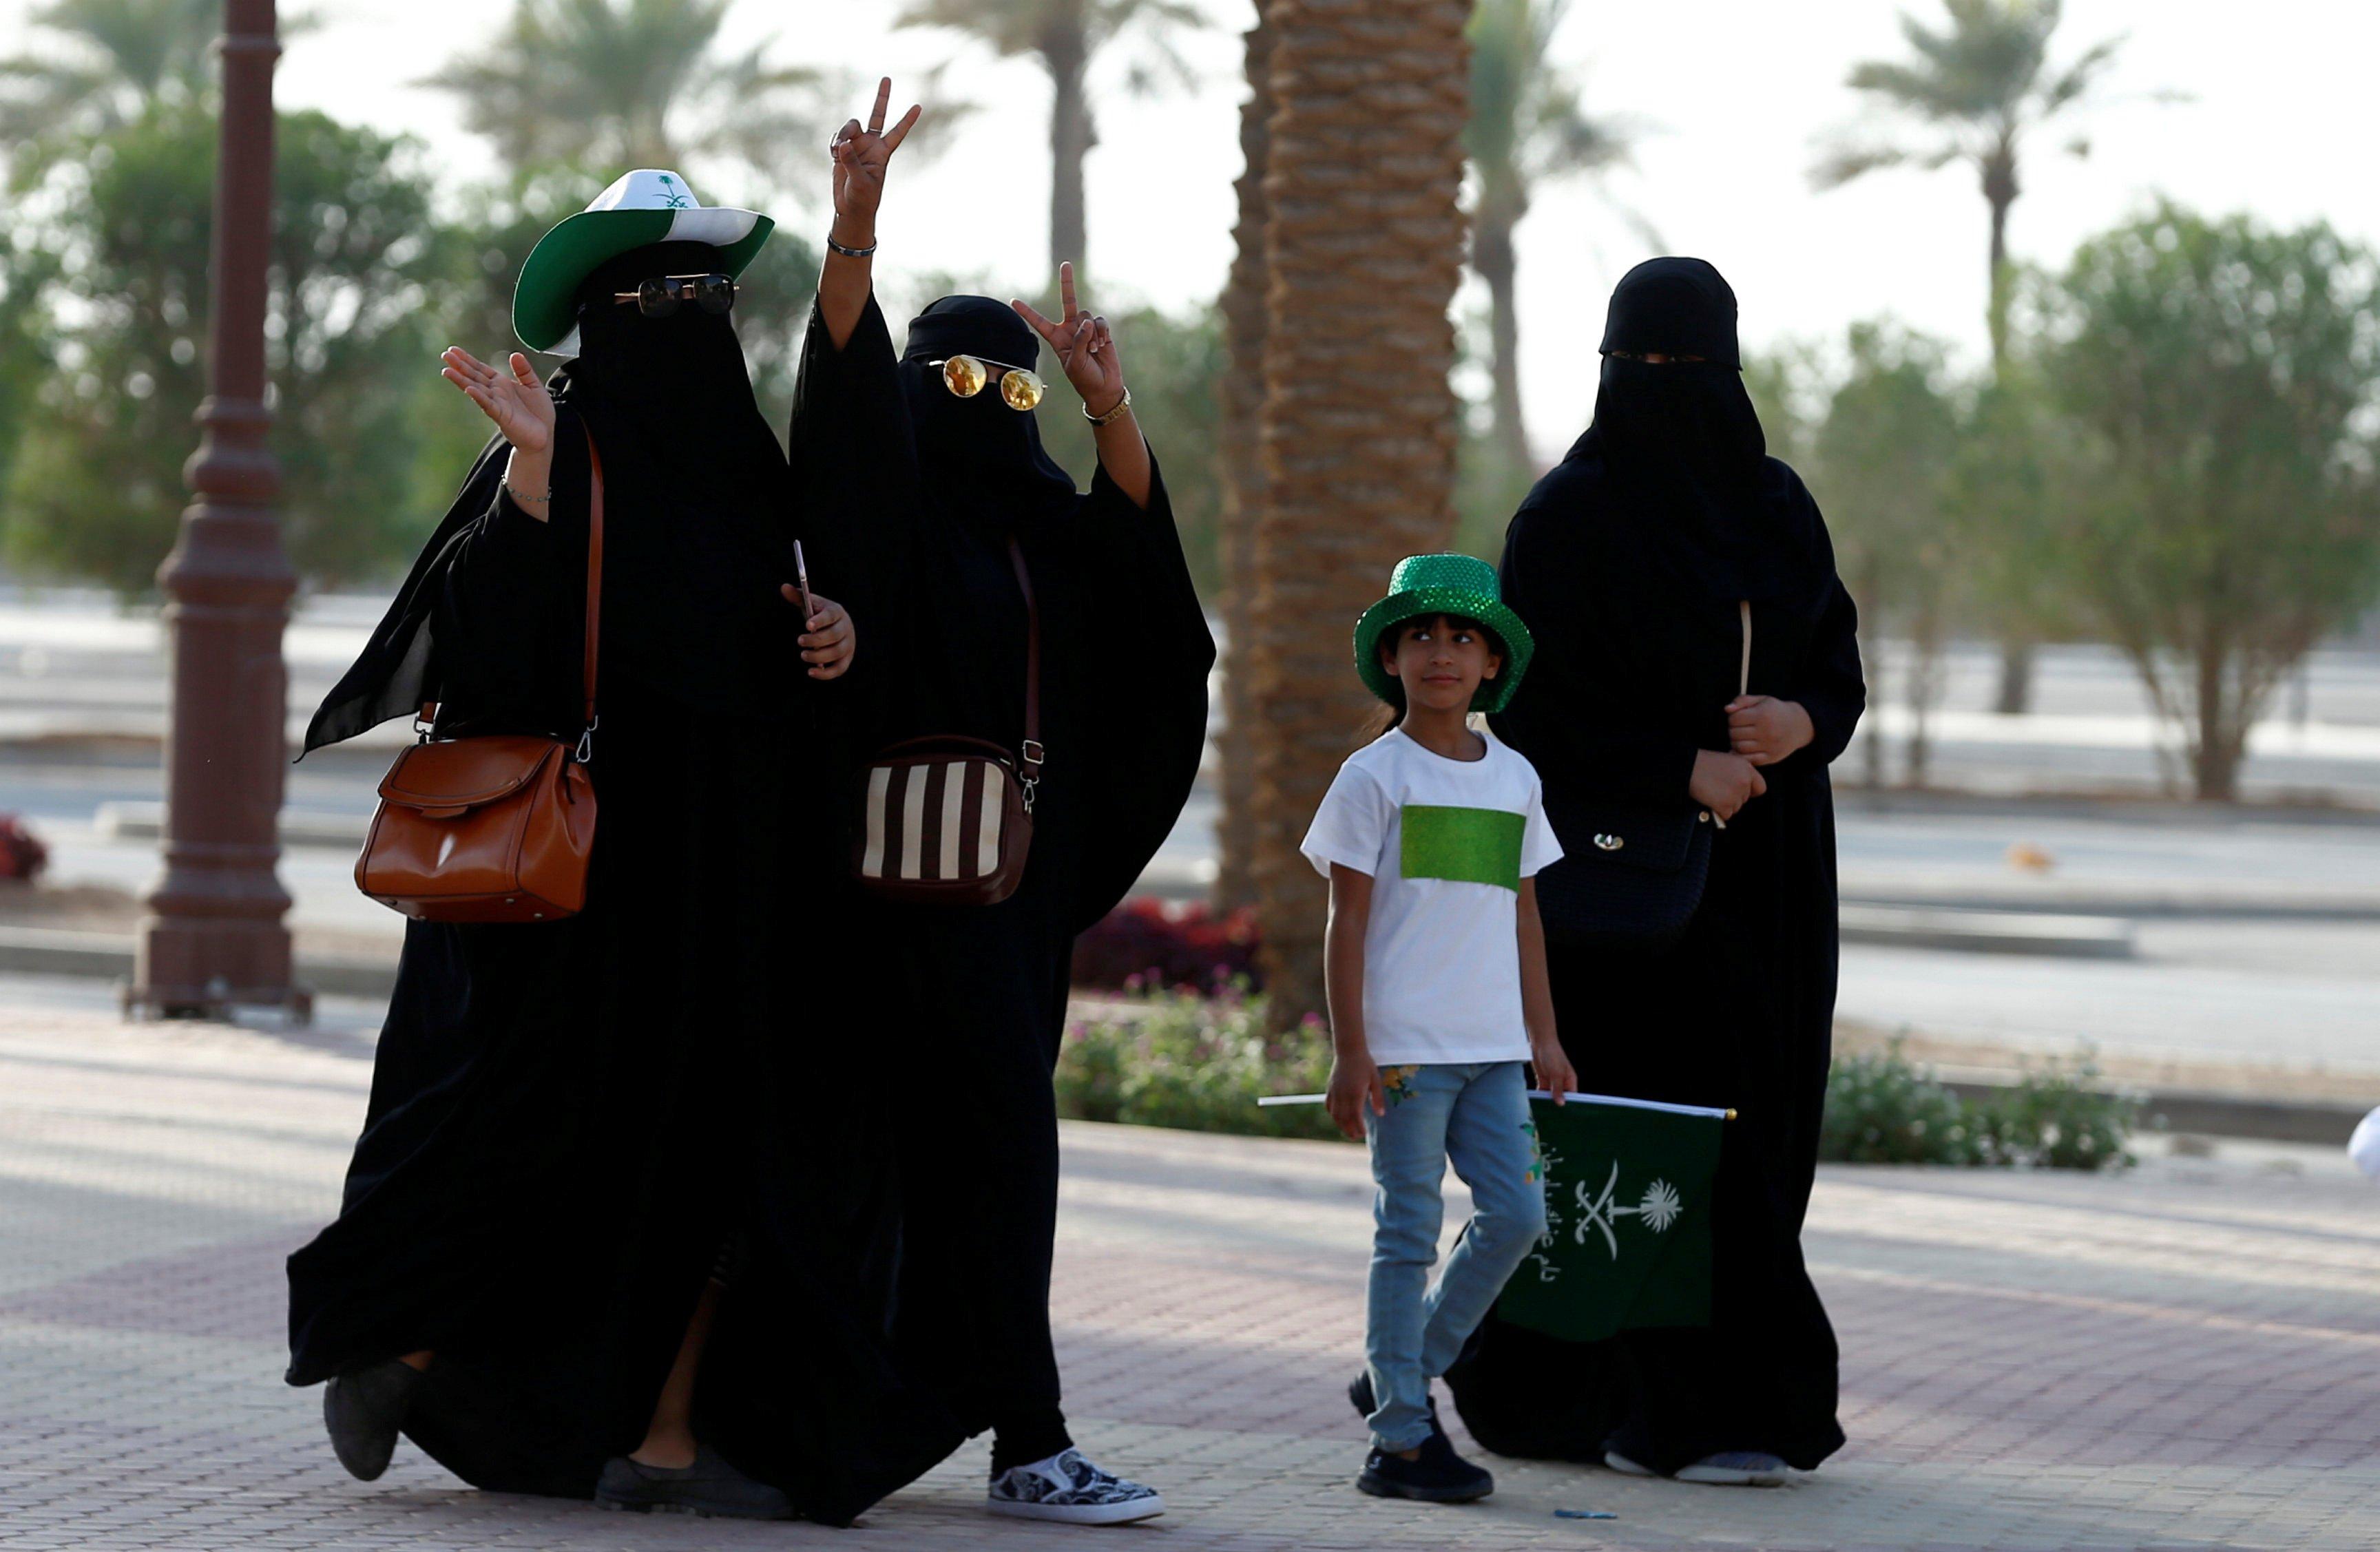 Saudi Arabia women arrive to a rally to celebrate the 87th annual National Day of Saudi Arabia in Riyadh, Saudi Arabia, 23 September 2017